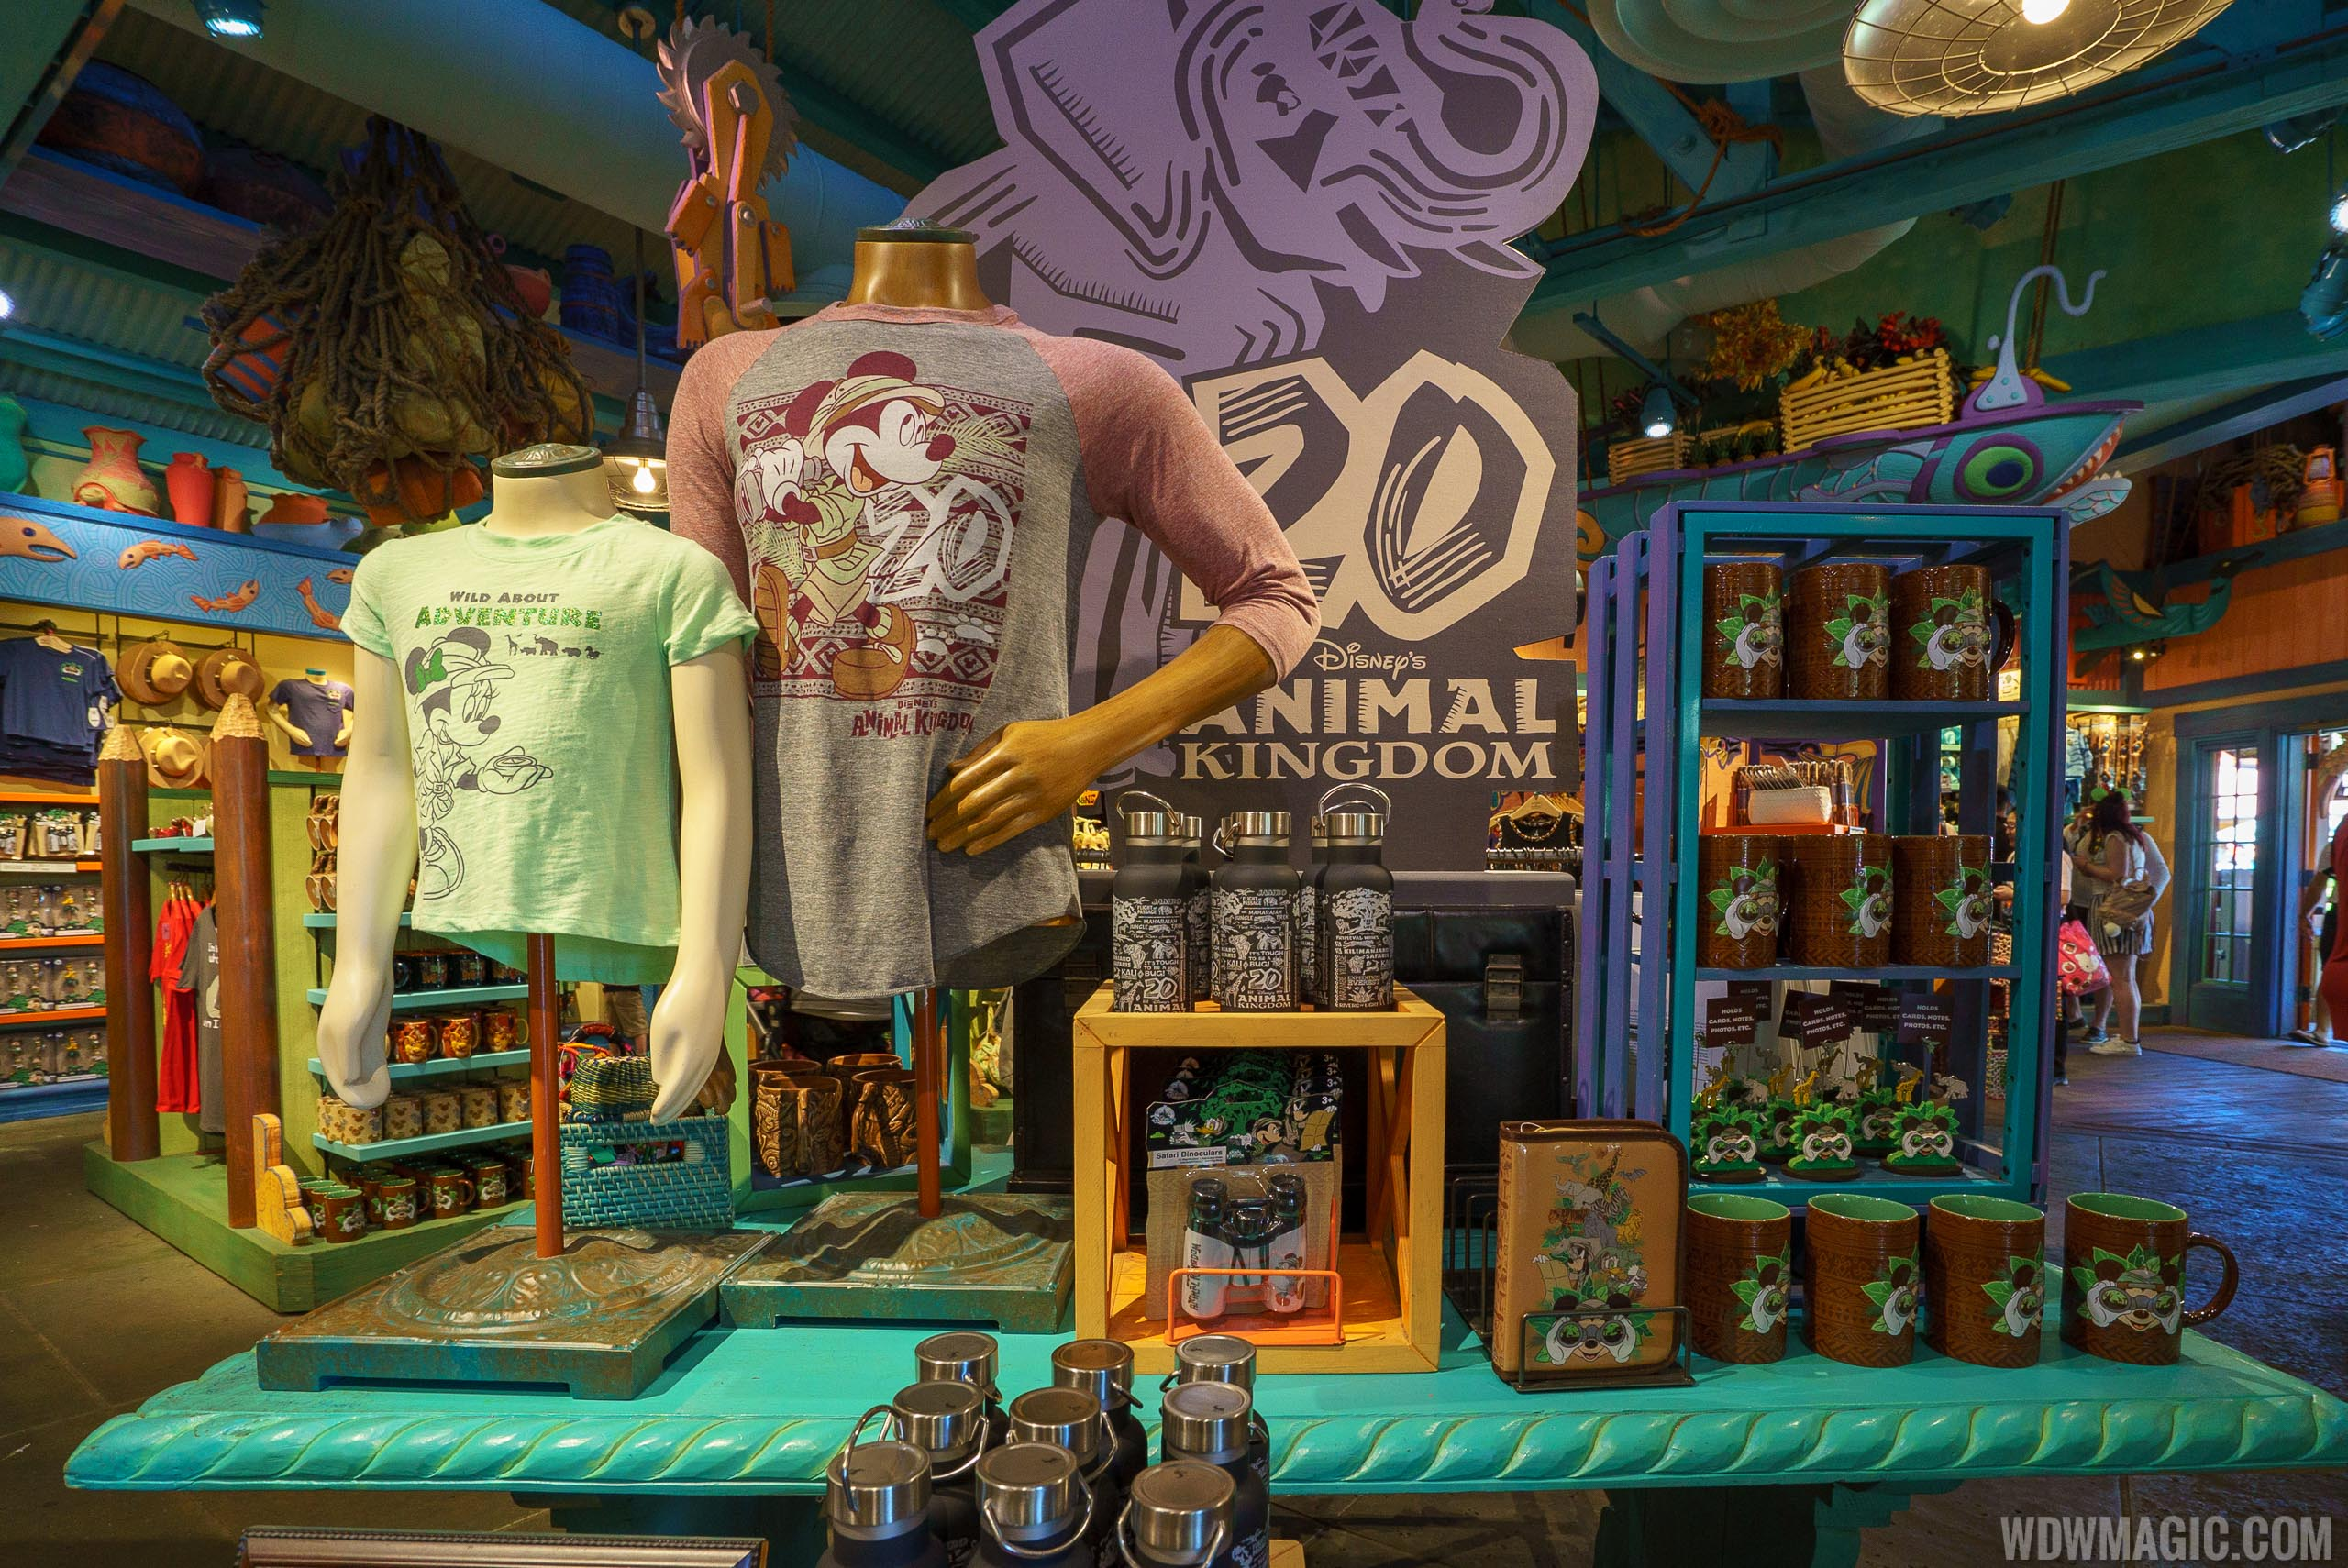 Disney's Animal Kingdom 20th anniversary merchandise